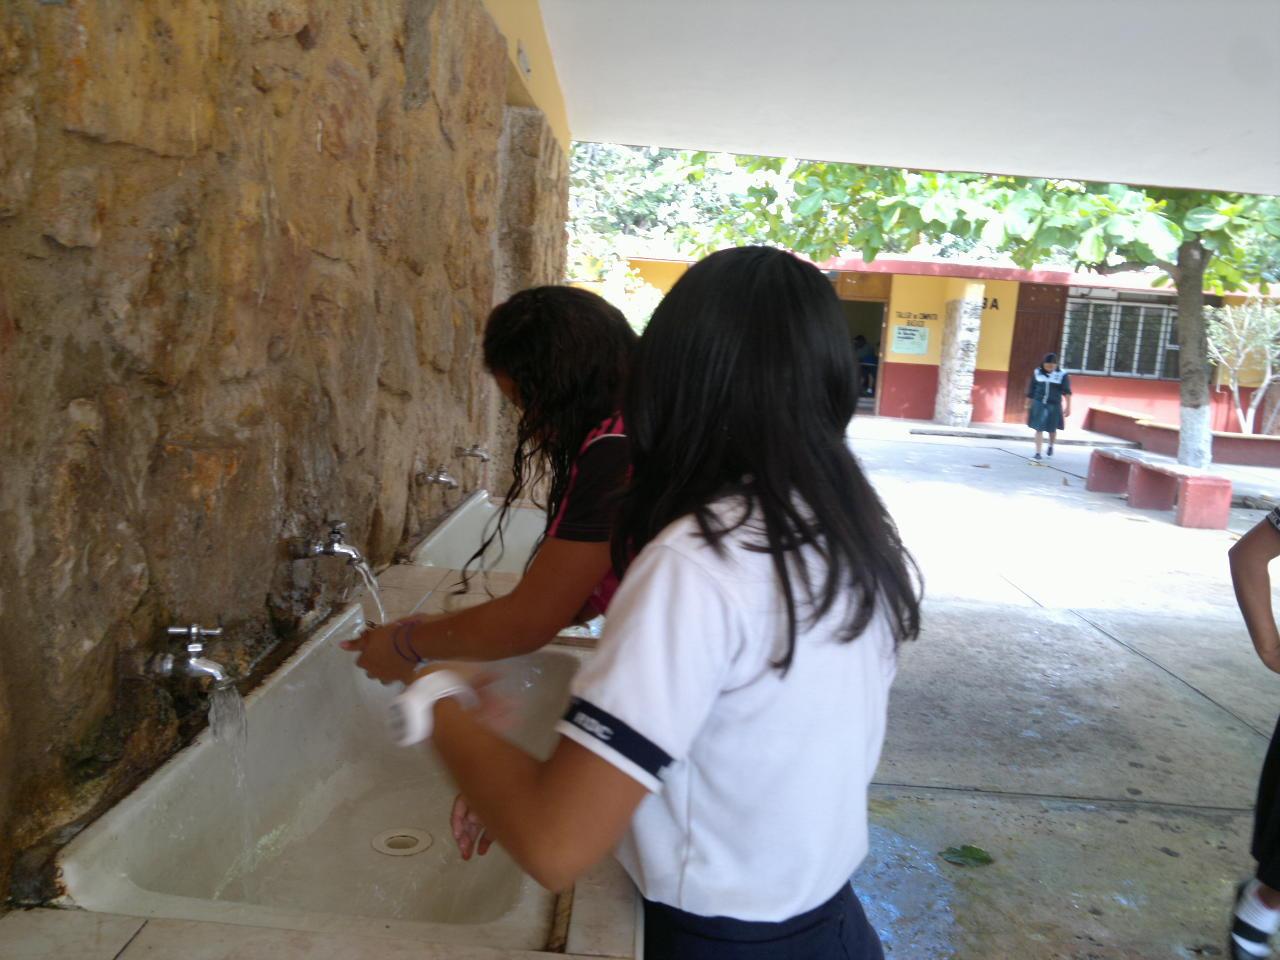 Marijoseinforma for Llave tirando agua